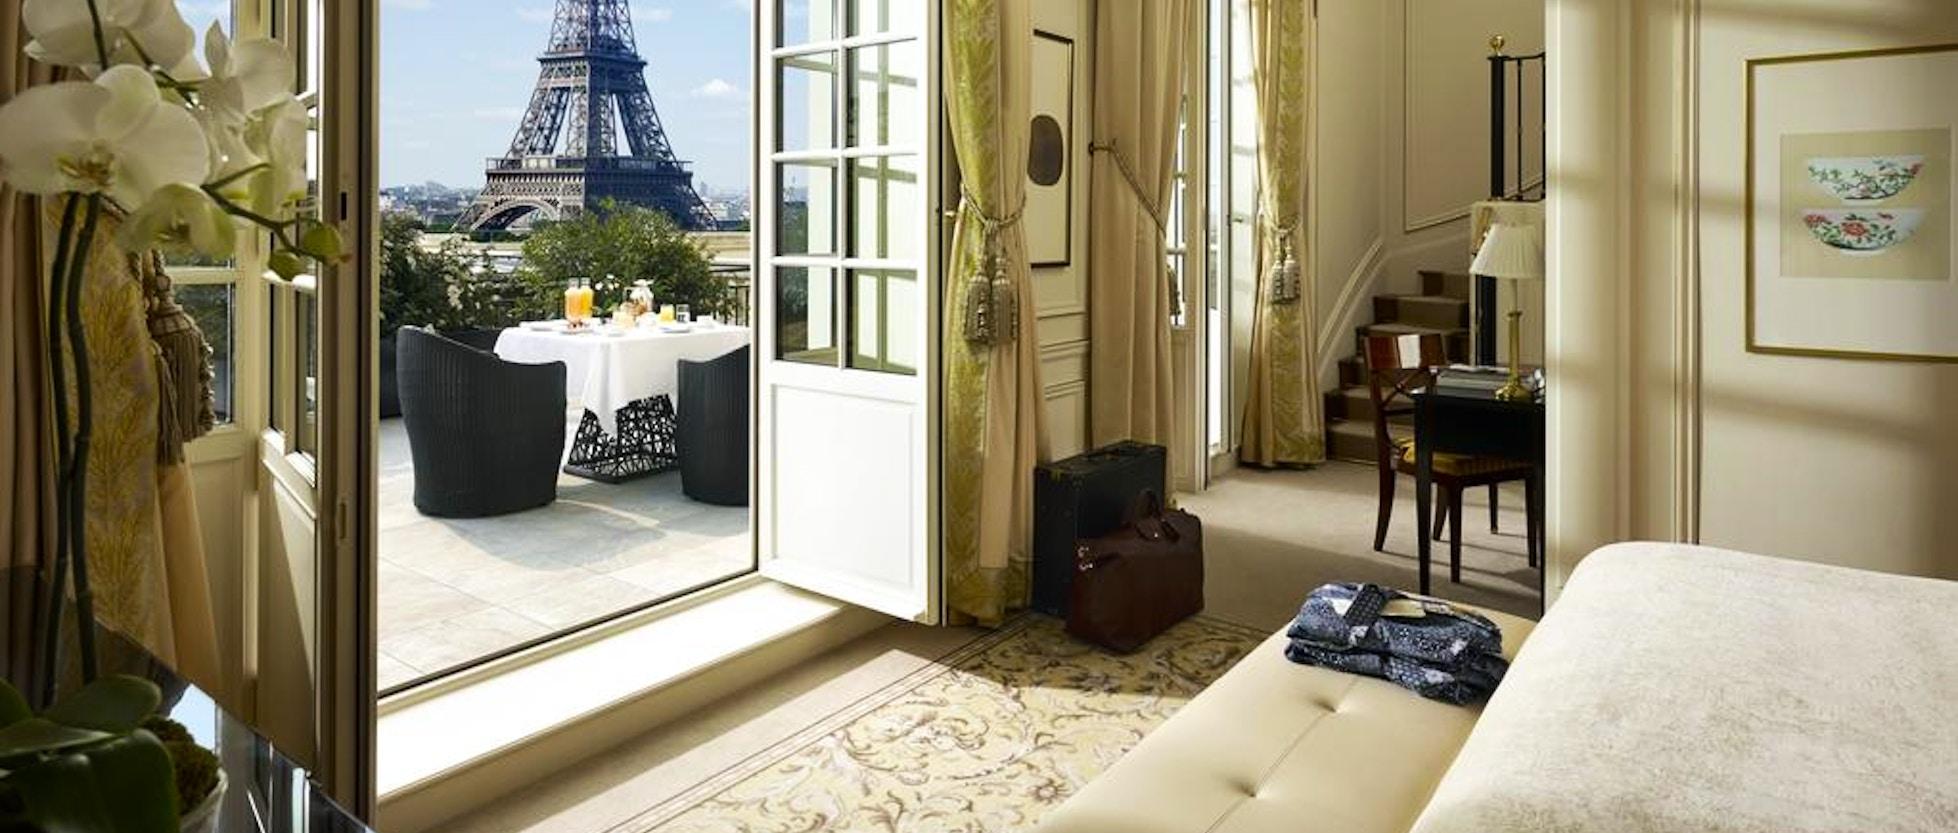 9 hotel ideali per un romantico weekend a parigi | vivi parigi - Soggiorno Romantico Particolare 2